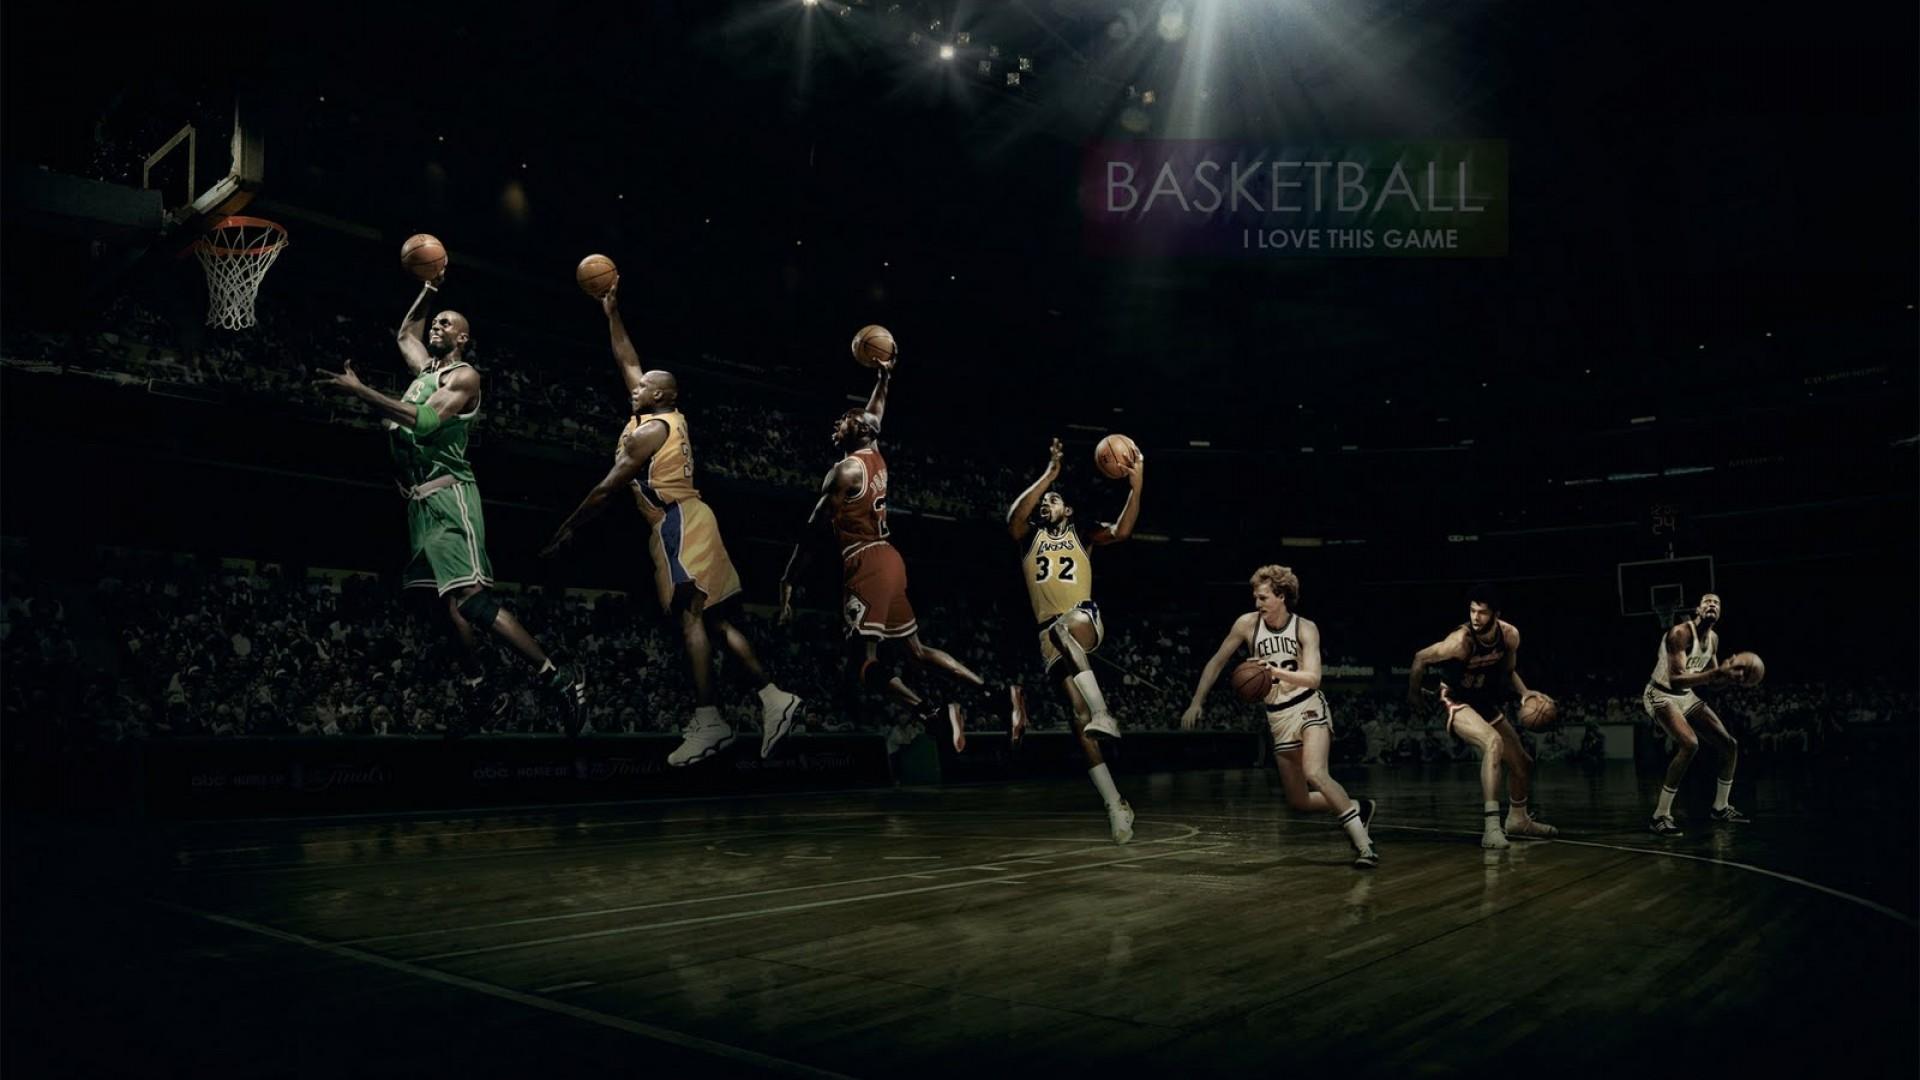 … Basketball-Wallpapers-HD …